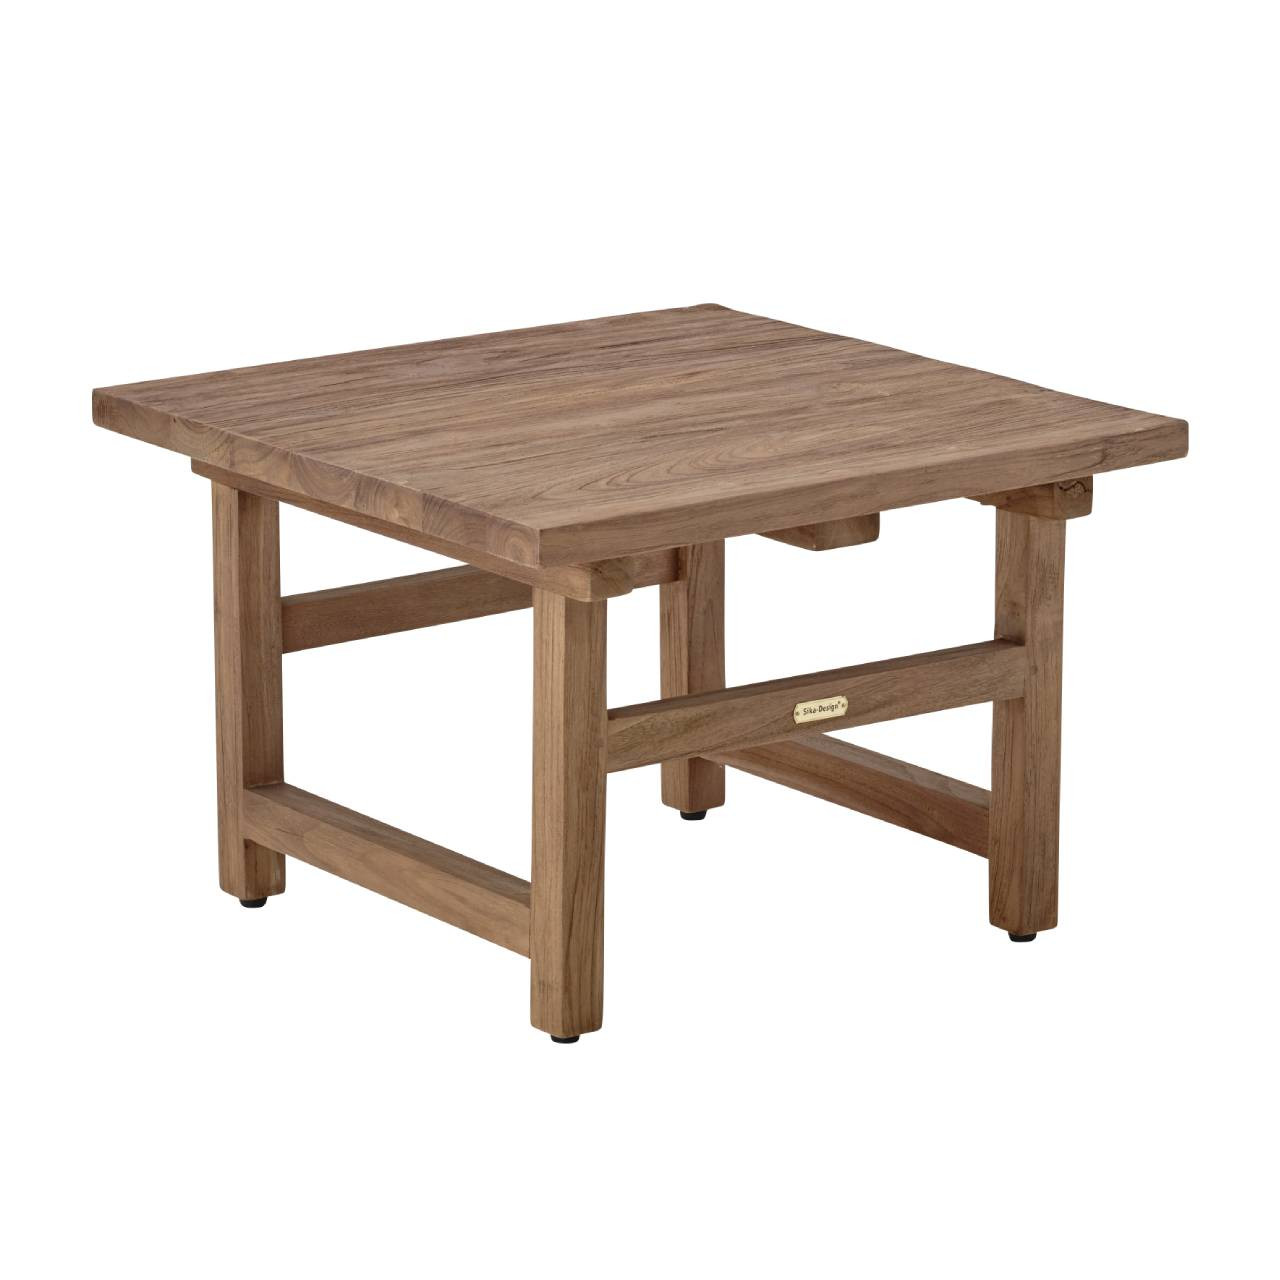 24 X 24 Coffee Table.Alfred Teak Coffee Table 24 X 24 In